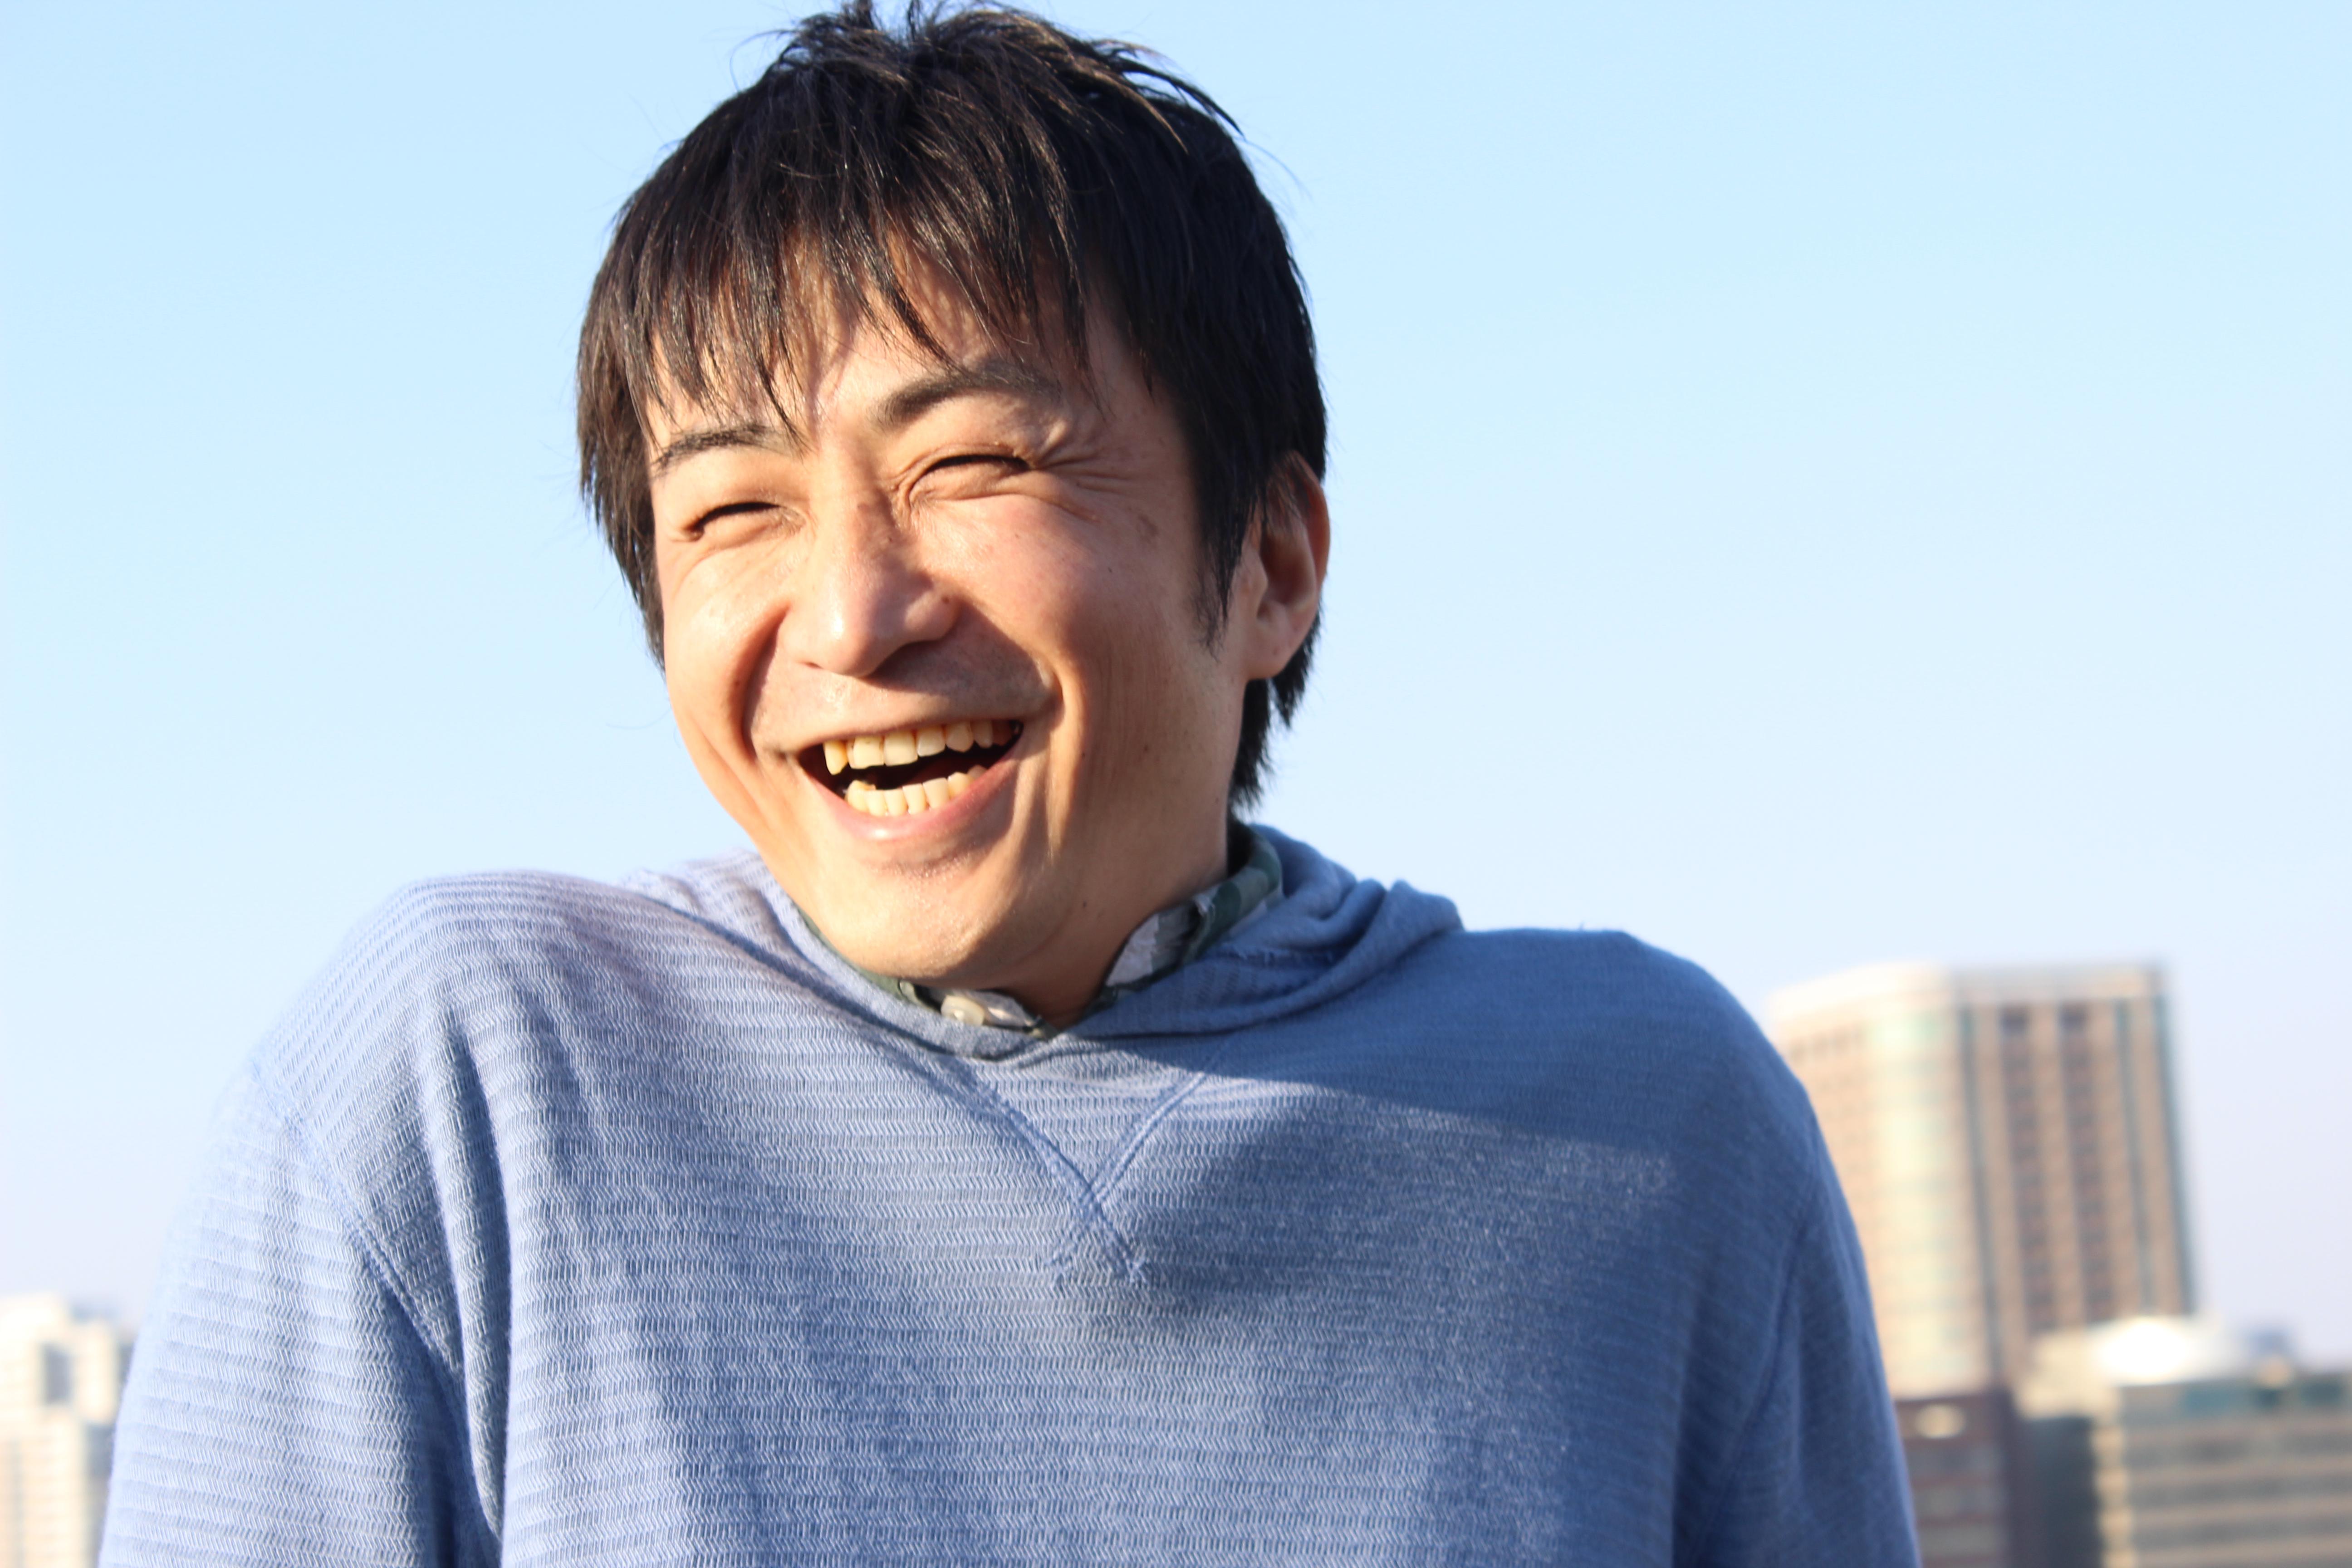 佐藤遼 - Wikipedia